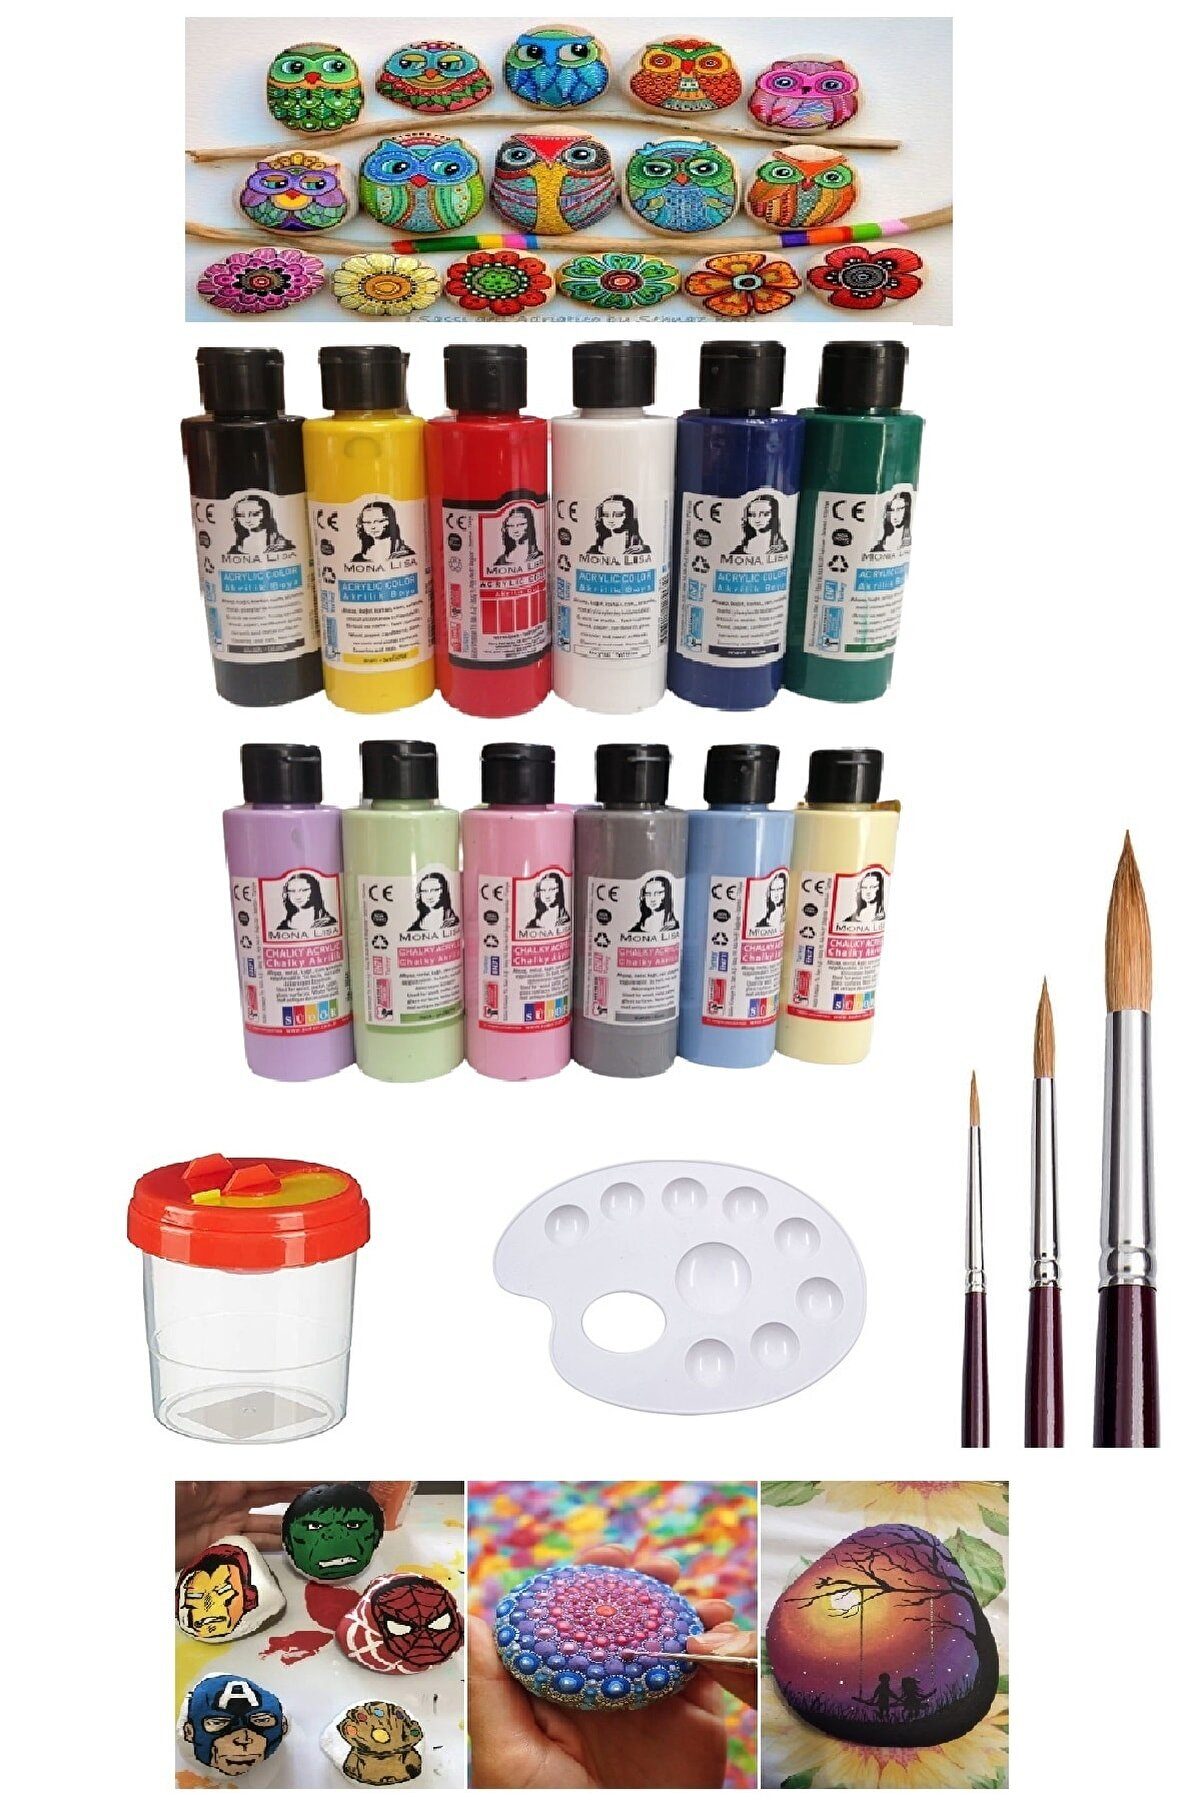 Südor Taş Boyama Seti 6 Ana Renk 6 Pastel Renk Set 1 Paket